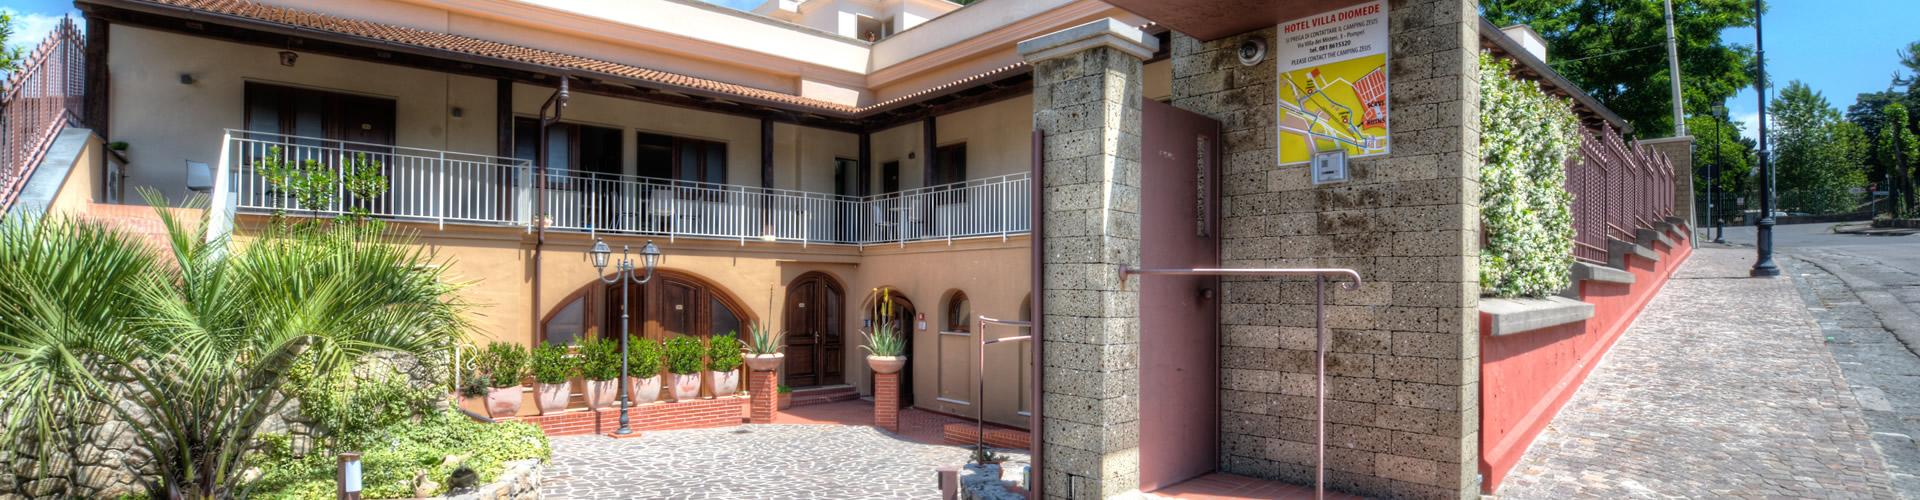 Hotel Villa Diomede